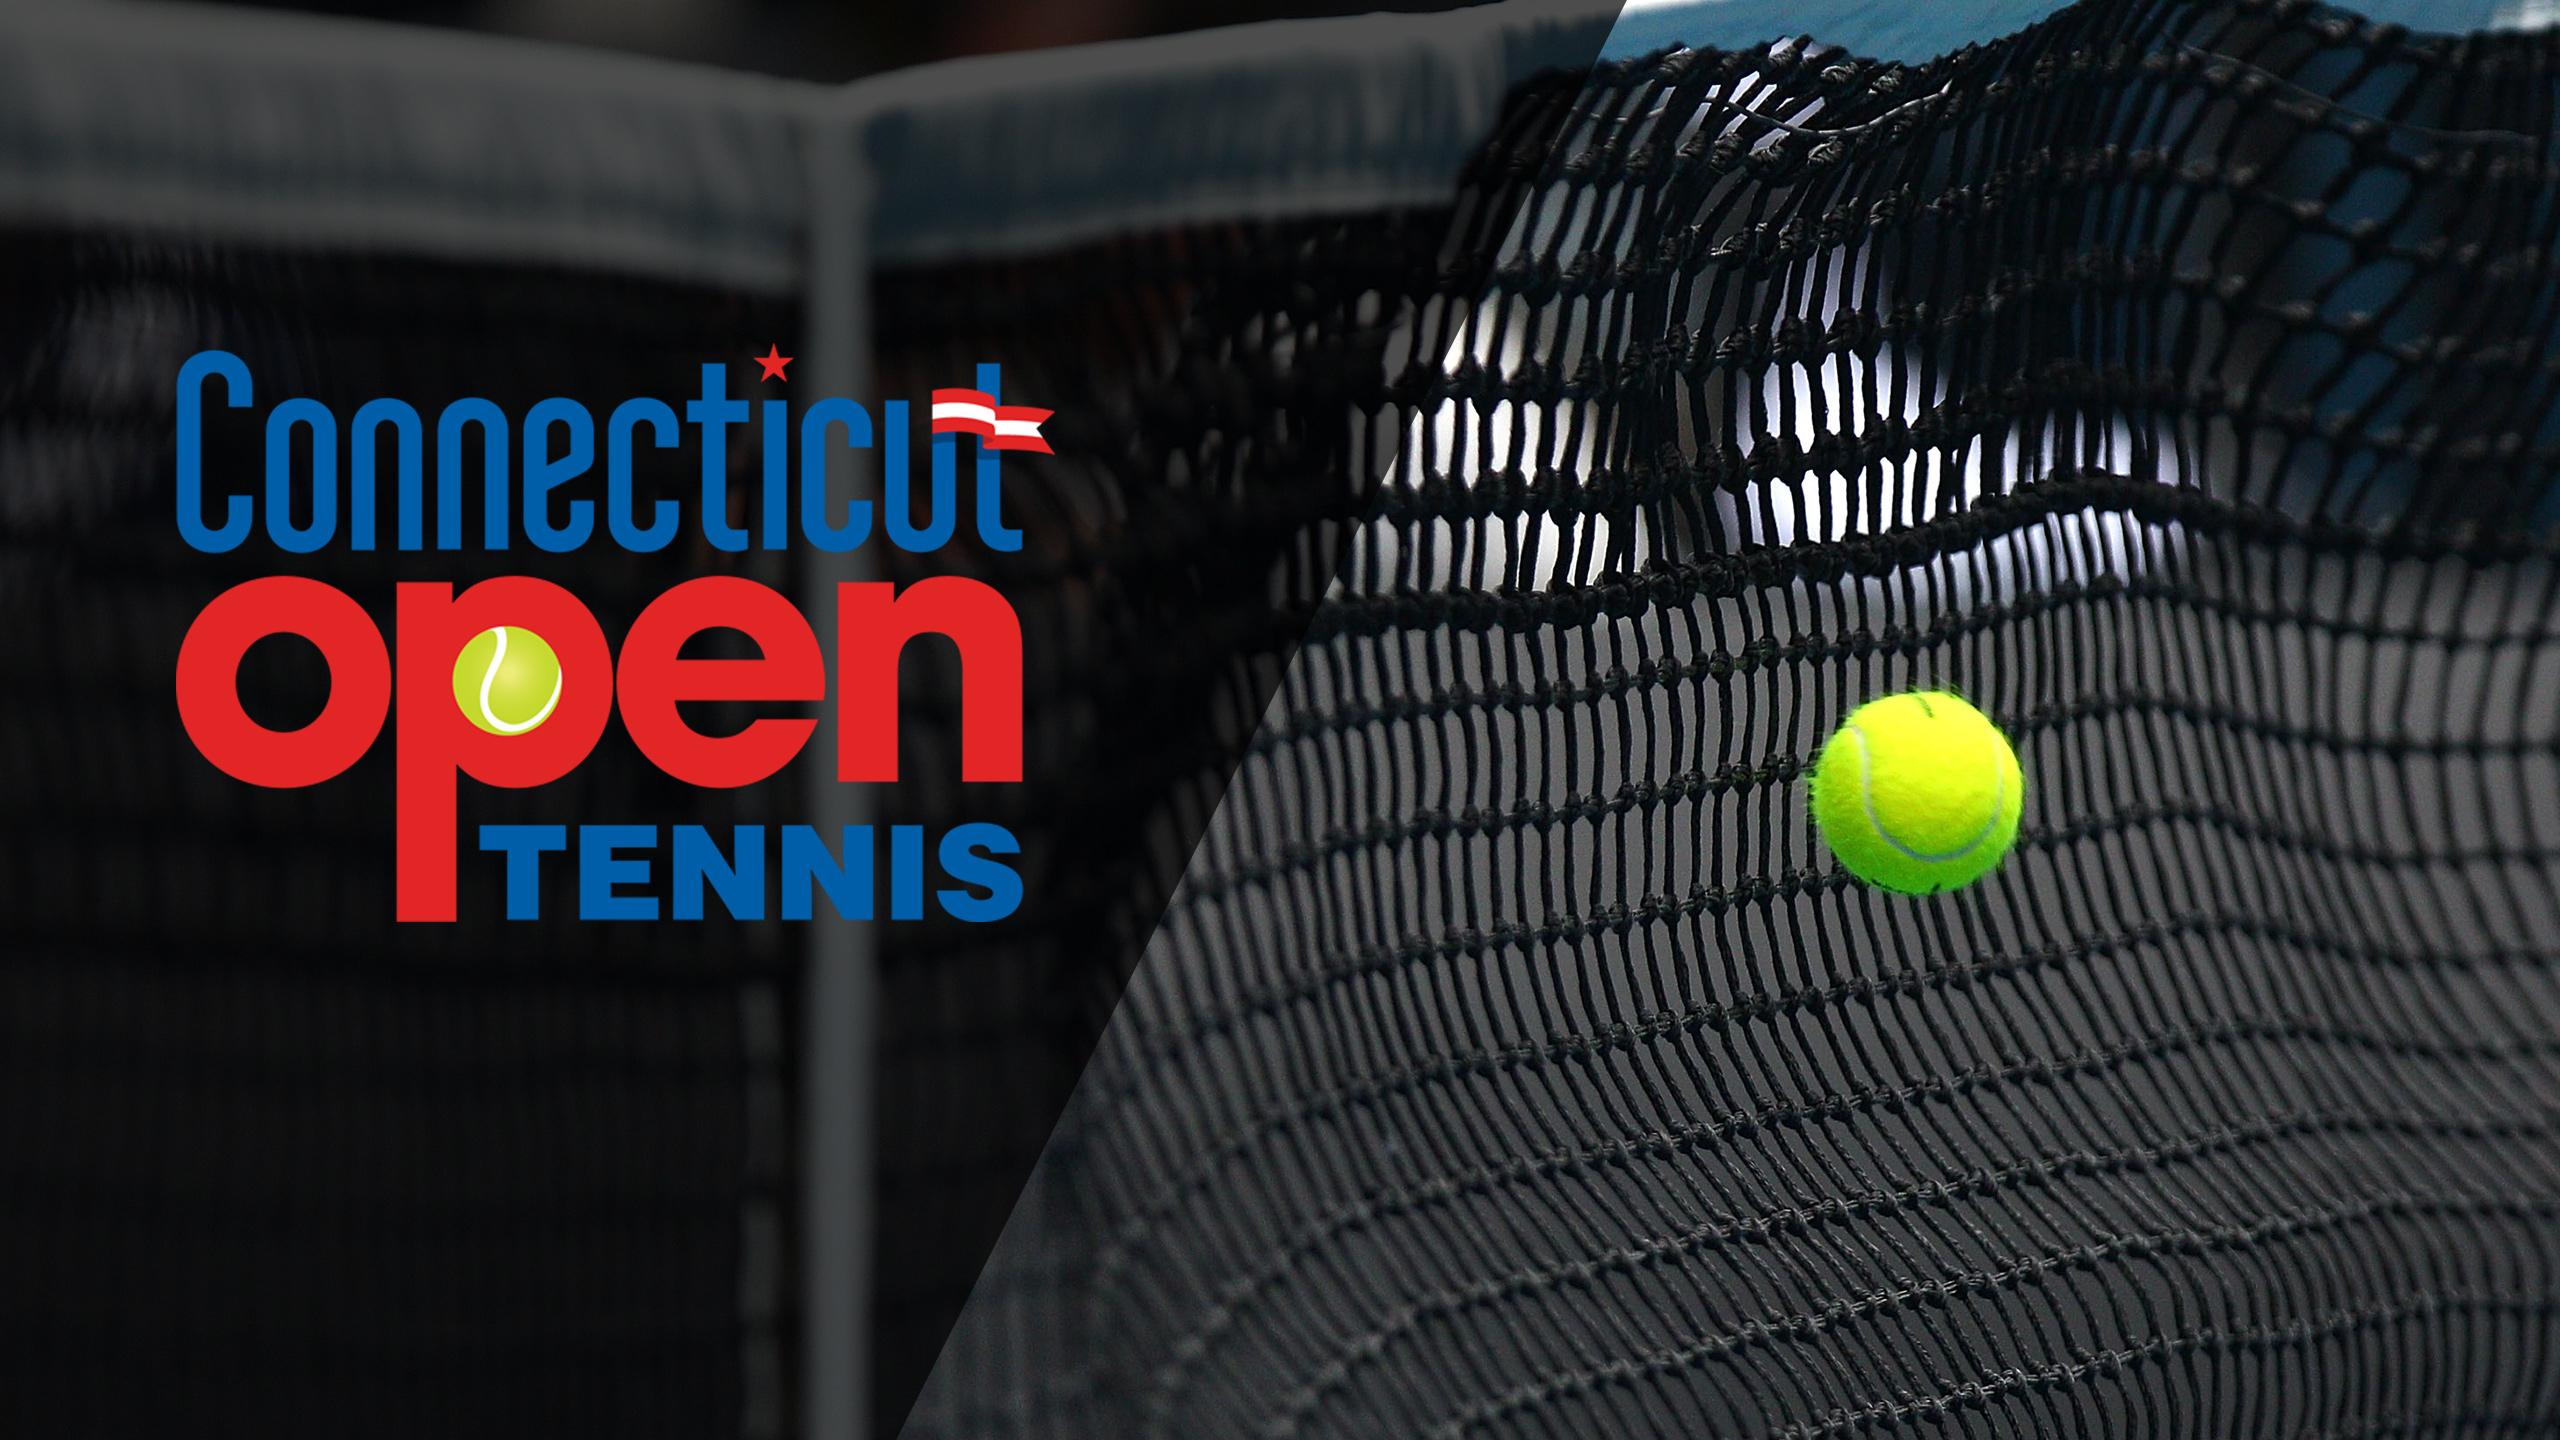 2018 US Open Series - Connecticut Open (Quarterfinal #4)